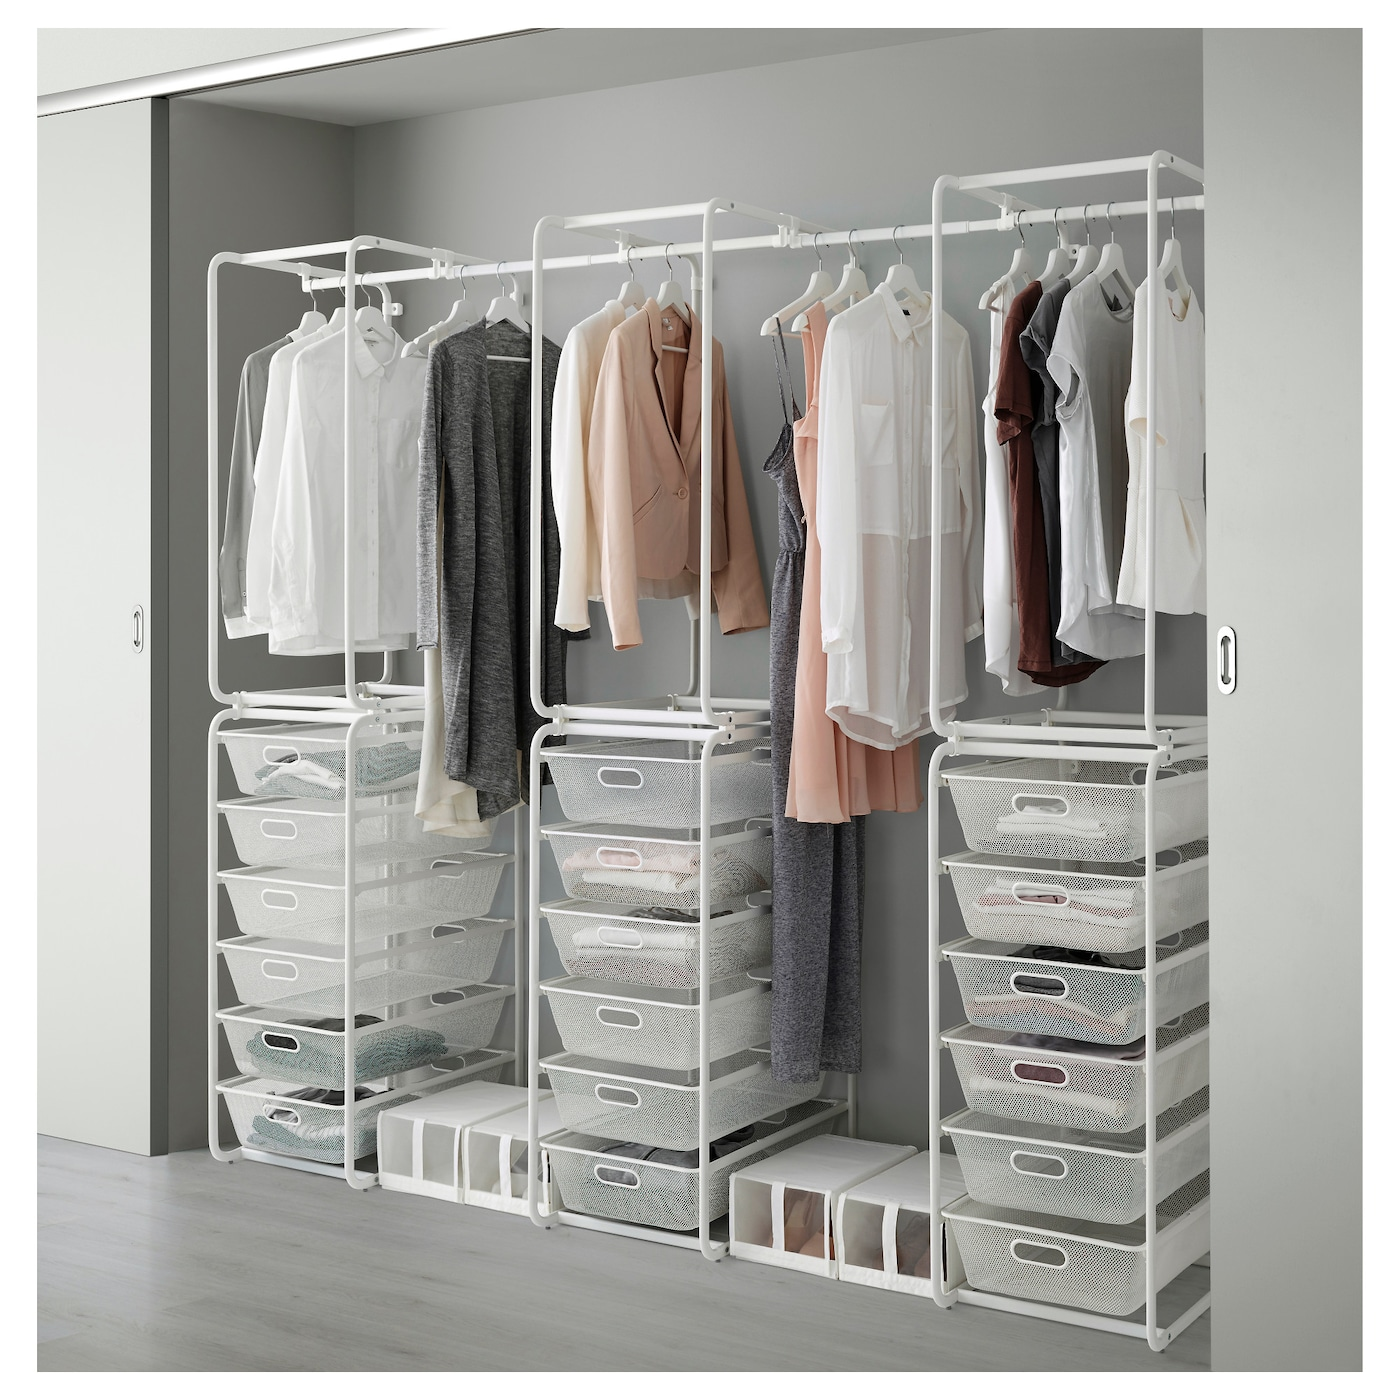 Algot frame mesh baskets rod white 203 243x60x206 cm ikea for Frame storage system